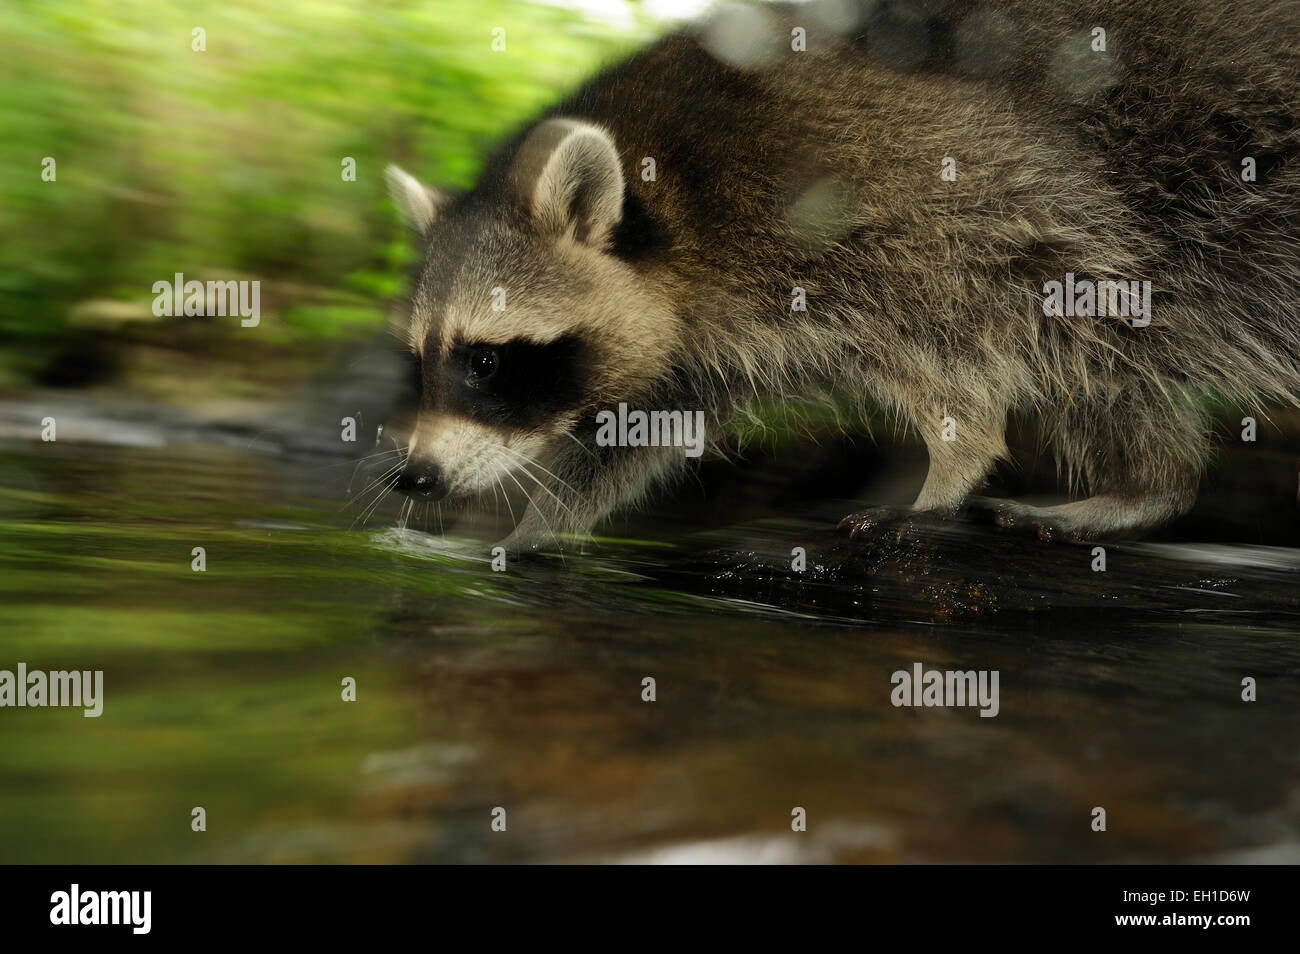 [Captive] Raccoon (Procione lotor) | Waschbär (Procione lotor) Immagini Stock